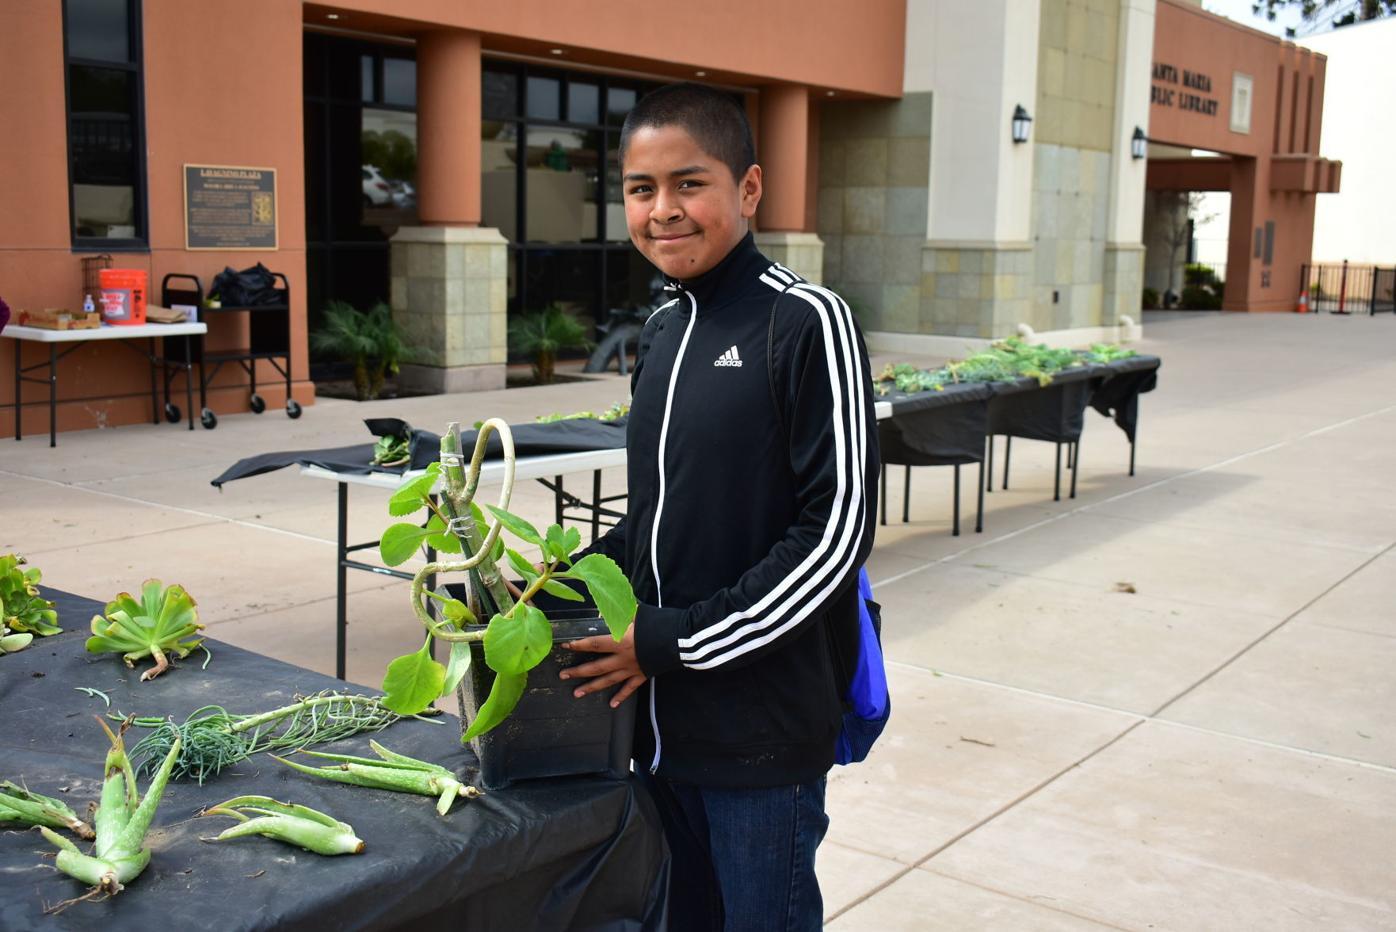 Photos: Succulent Saturday at the Santa Maria Public Library